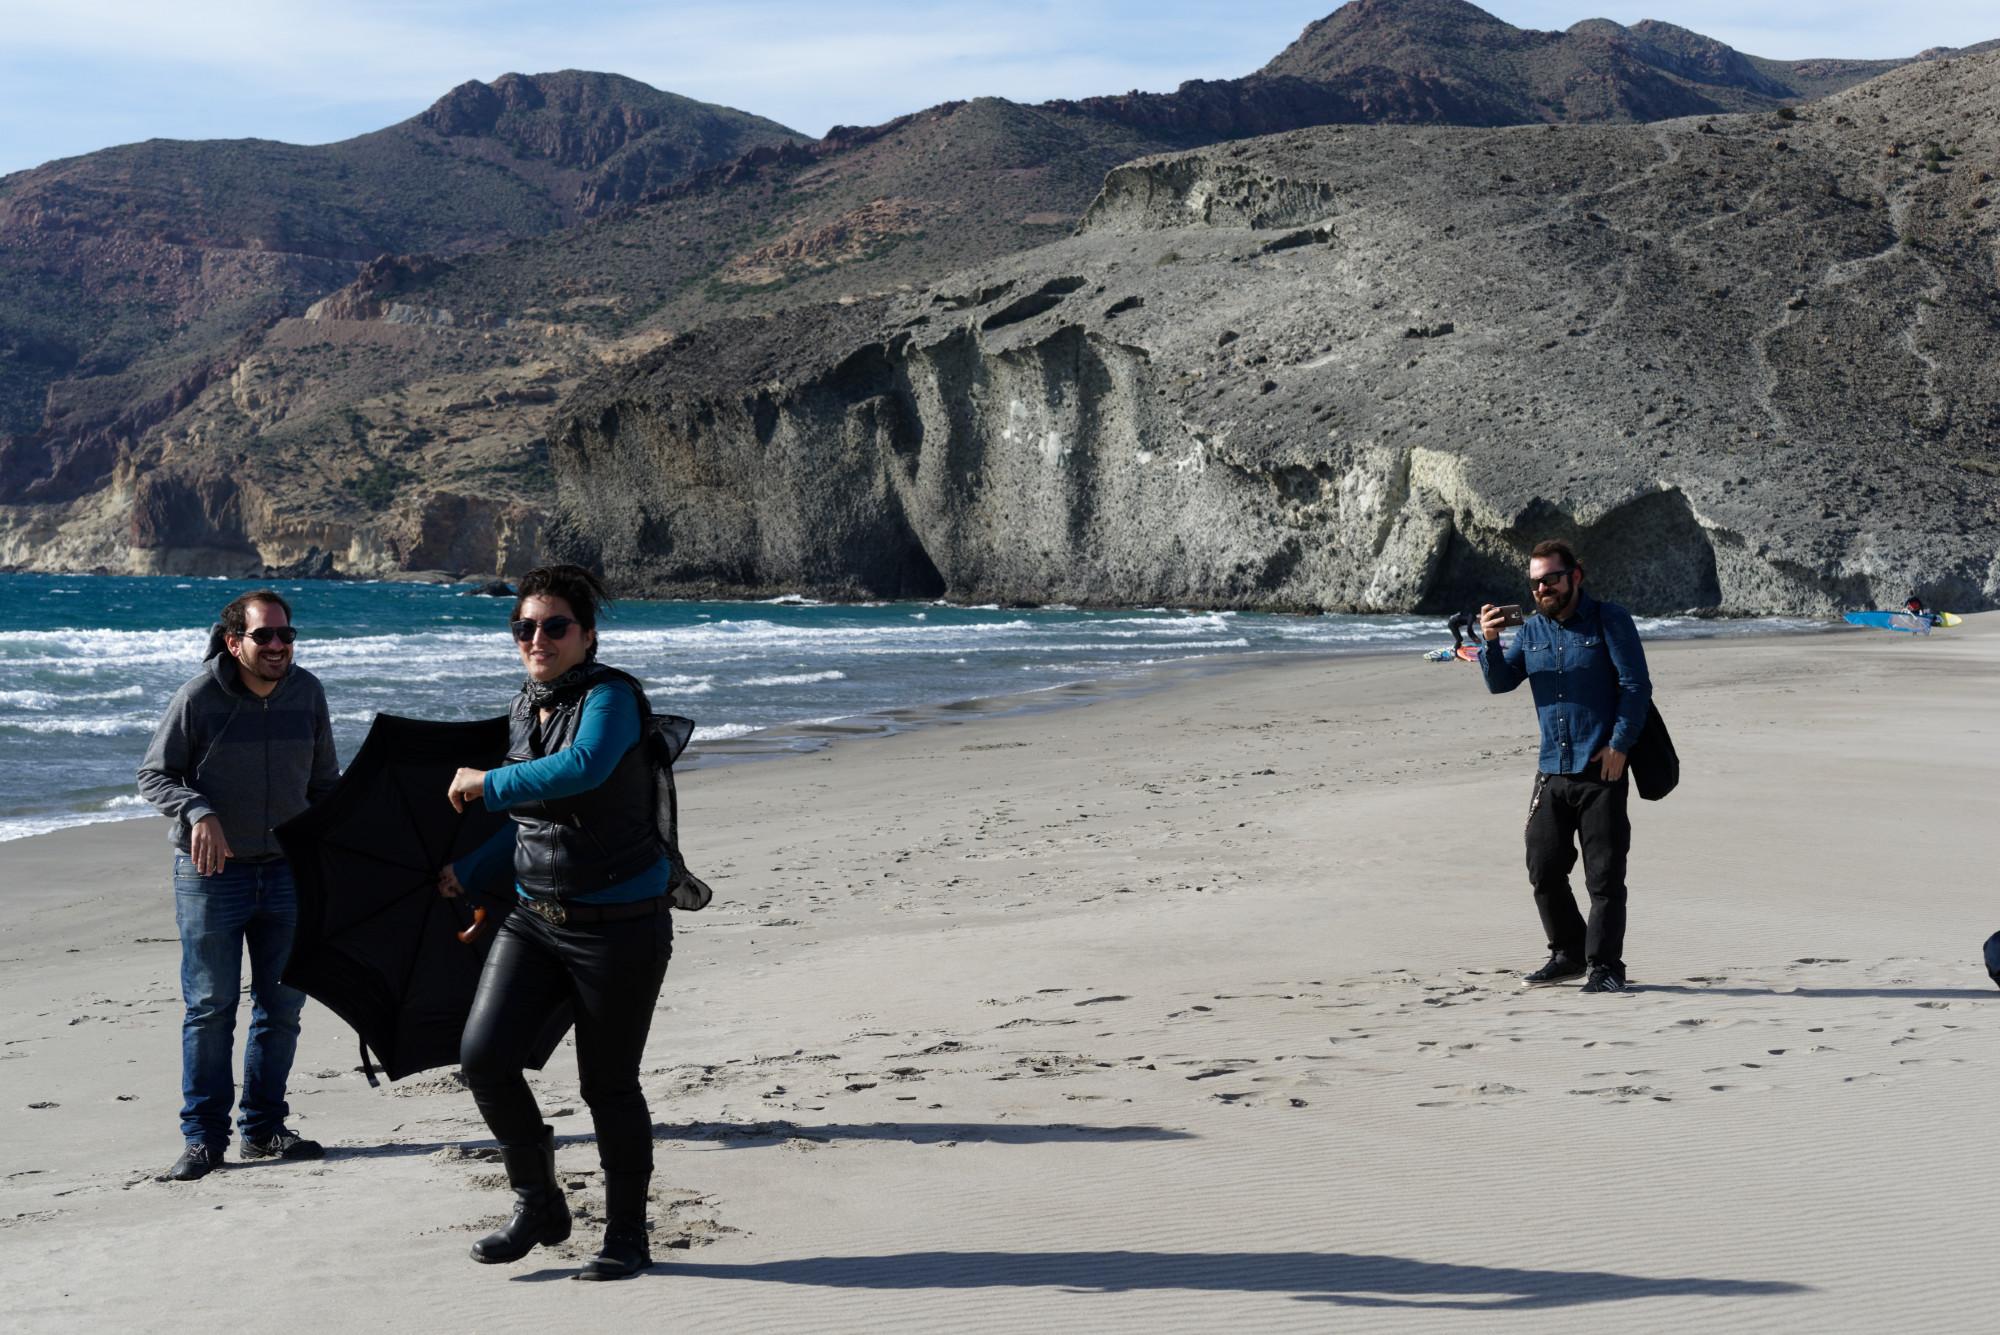 171214-San Jose-Playa del Monsul (Cabo de Gata-Andalousie) (159)